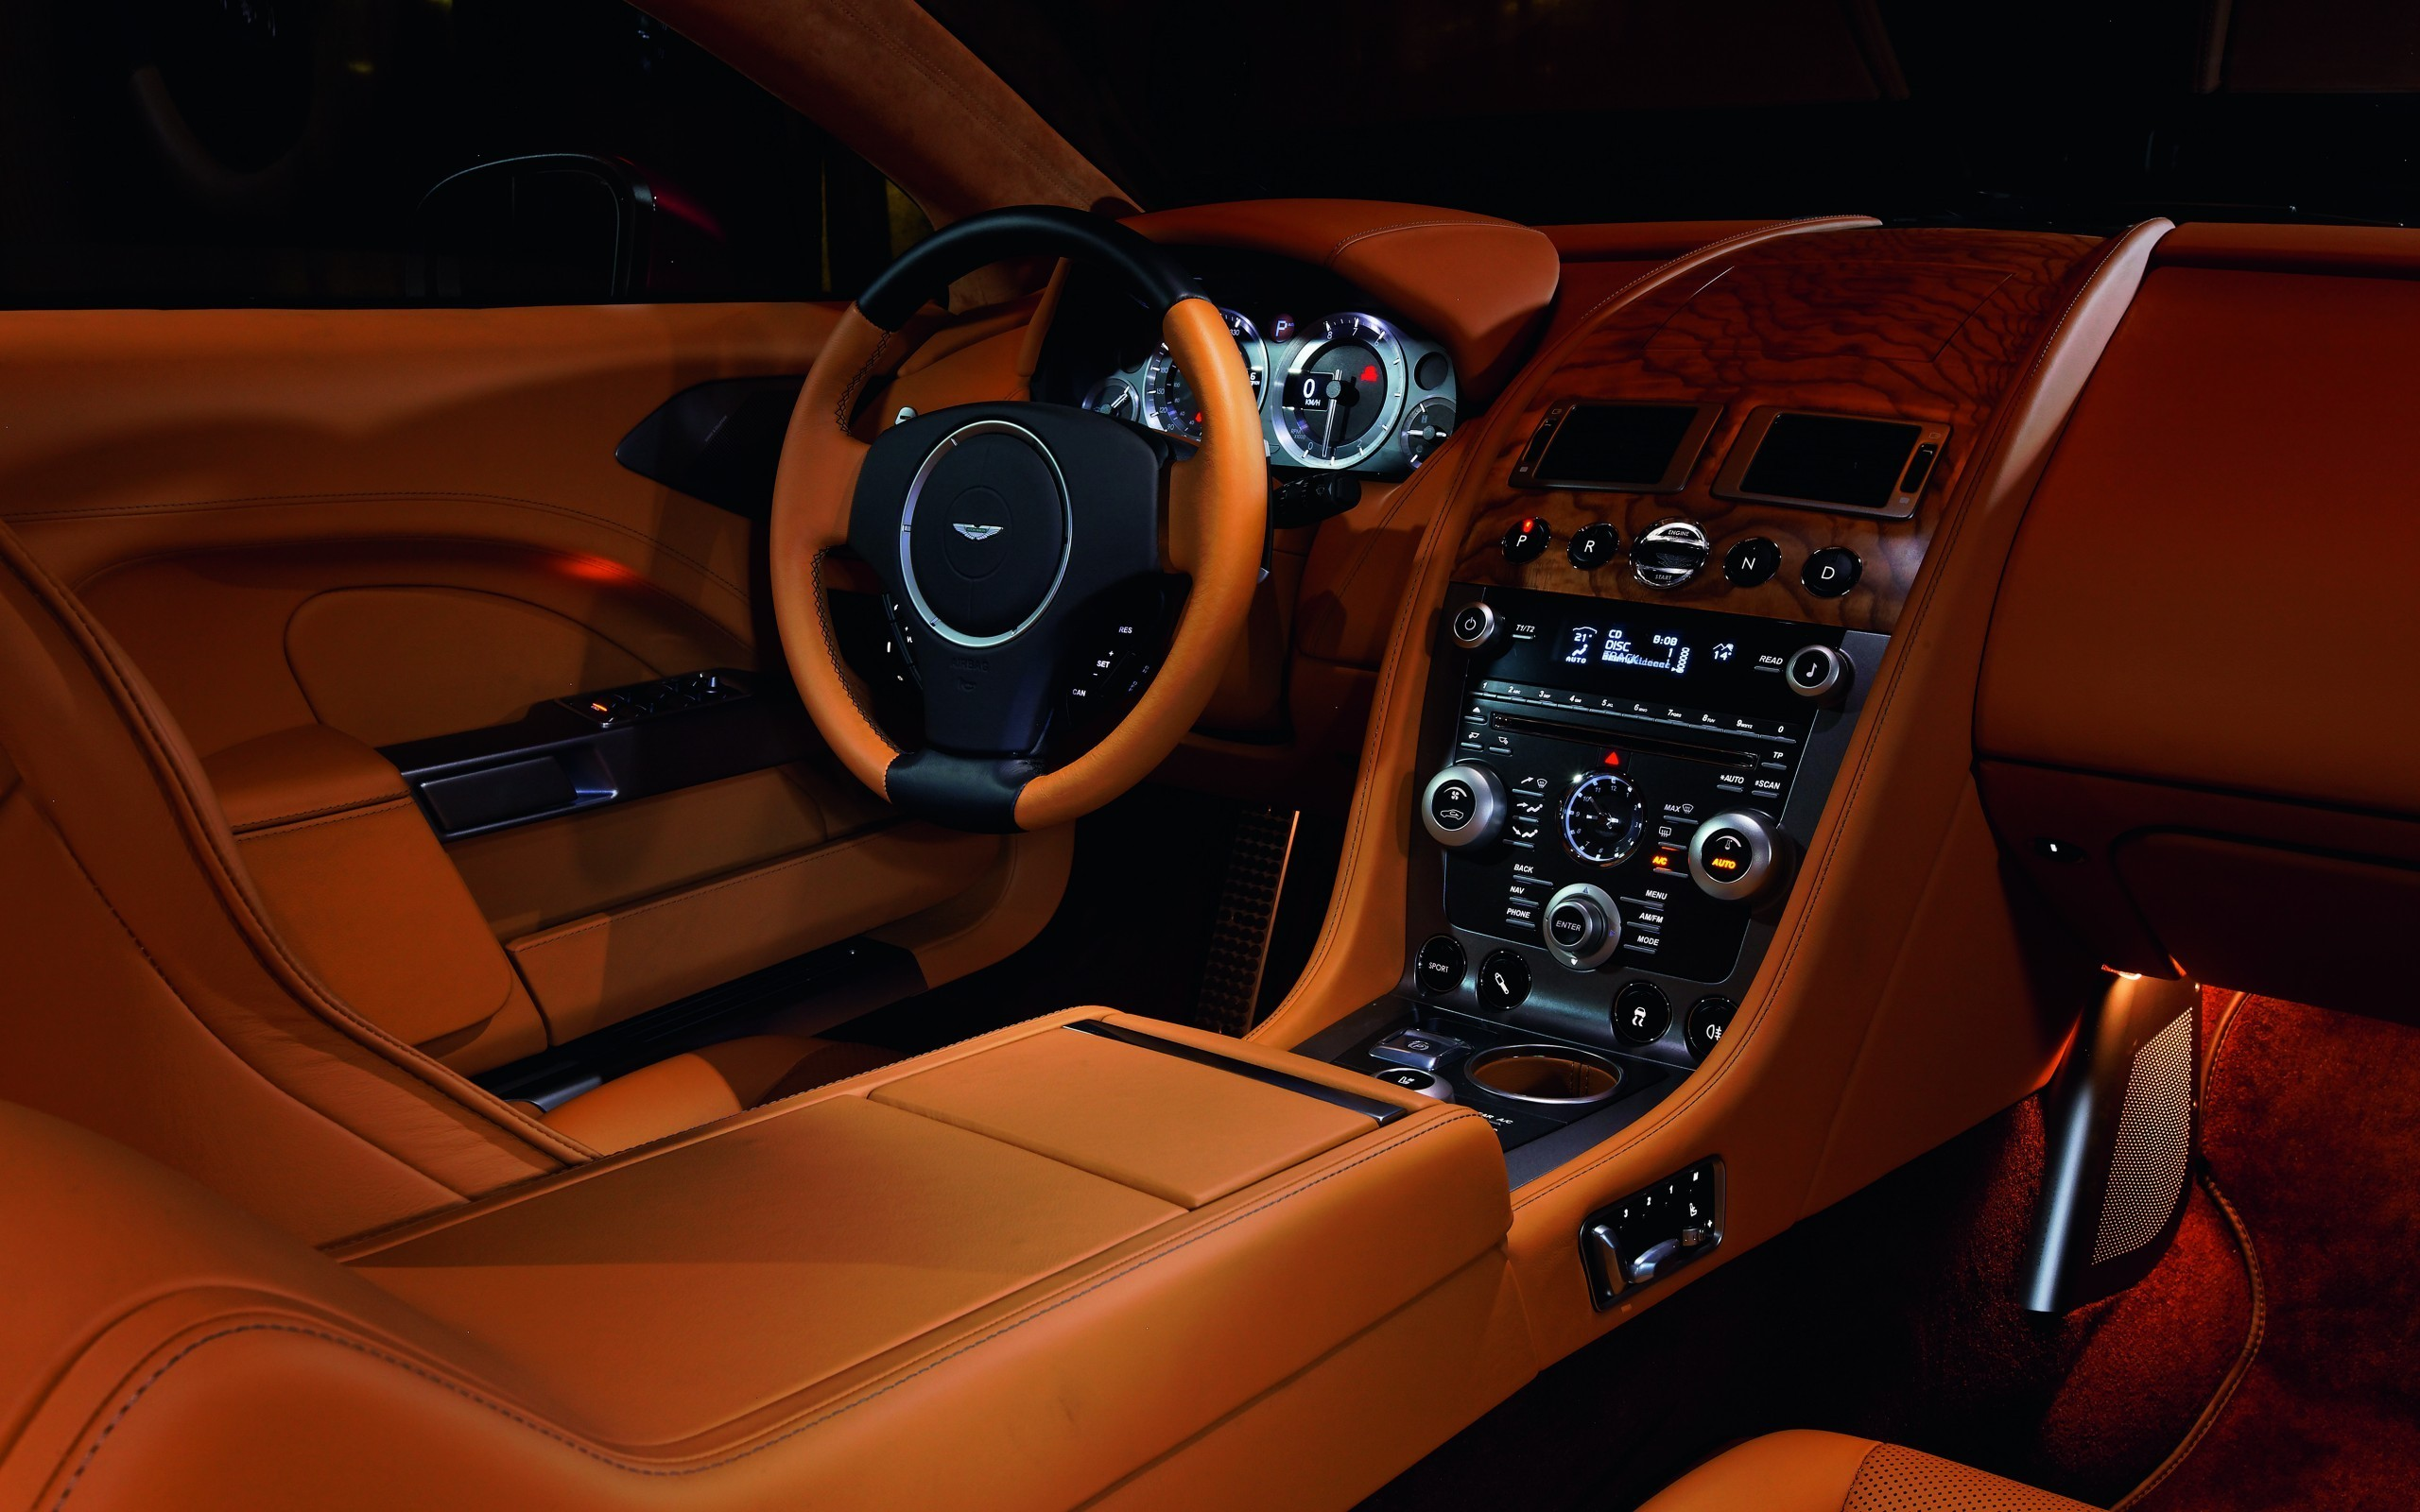 Rolls Royce Car Wallpaper Free Download Car Luxury Cars Interior Wallpaper Cars Wallpaper Better